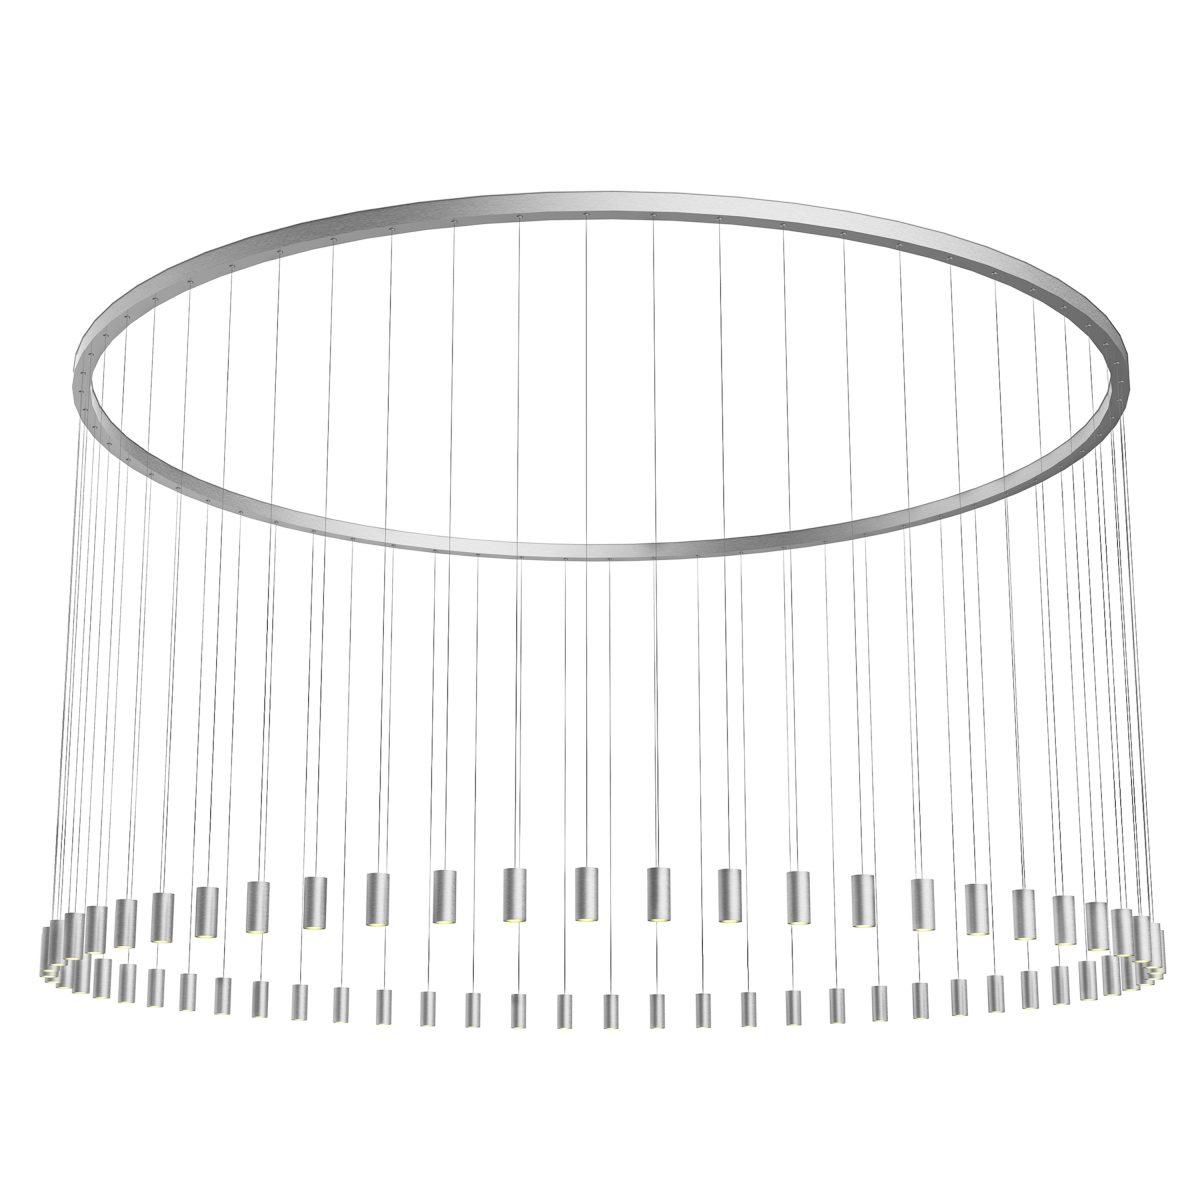 JSPR Myla Lamp XL 150 Silver